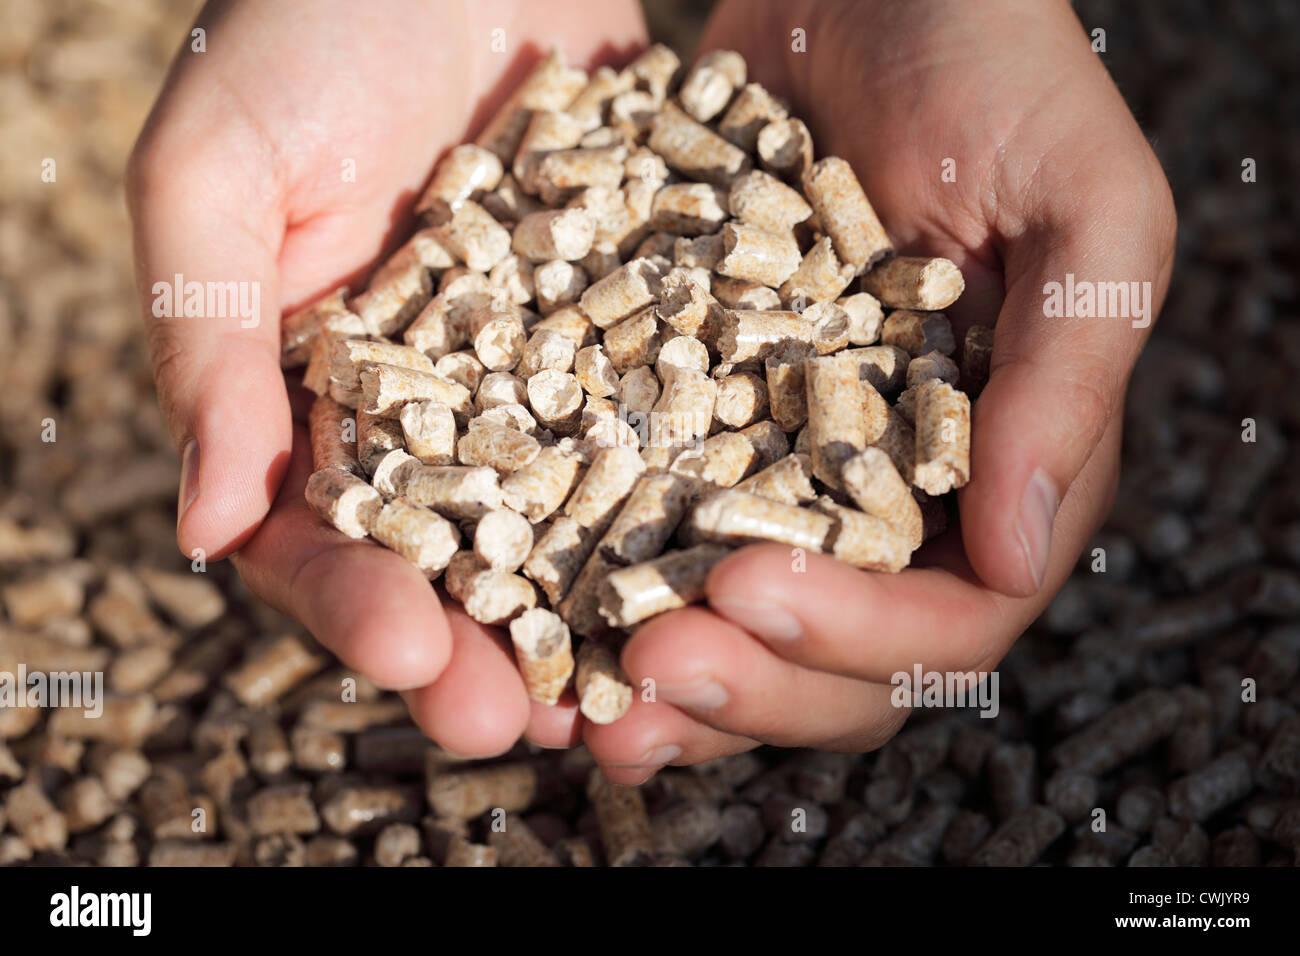 Alternative fuel: Pellets made from industrial wood waste. Short depth-of-field. - Stock Image